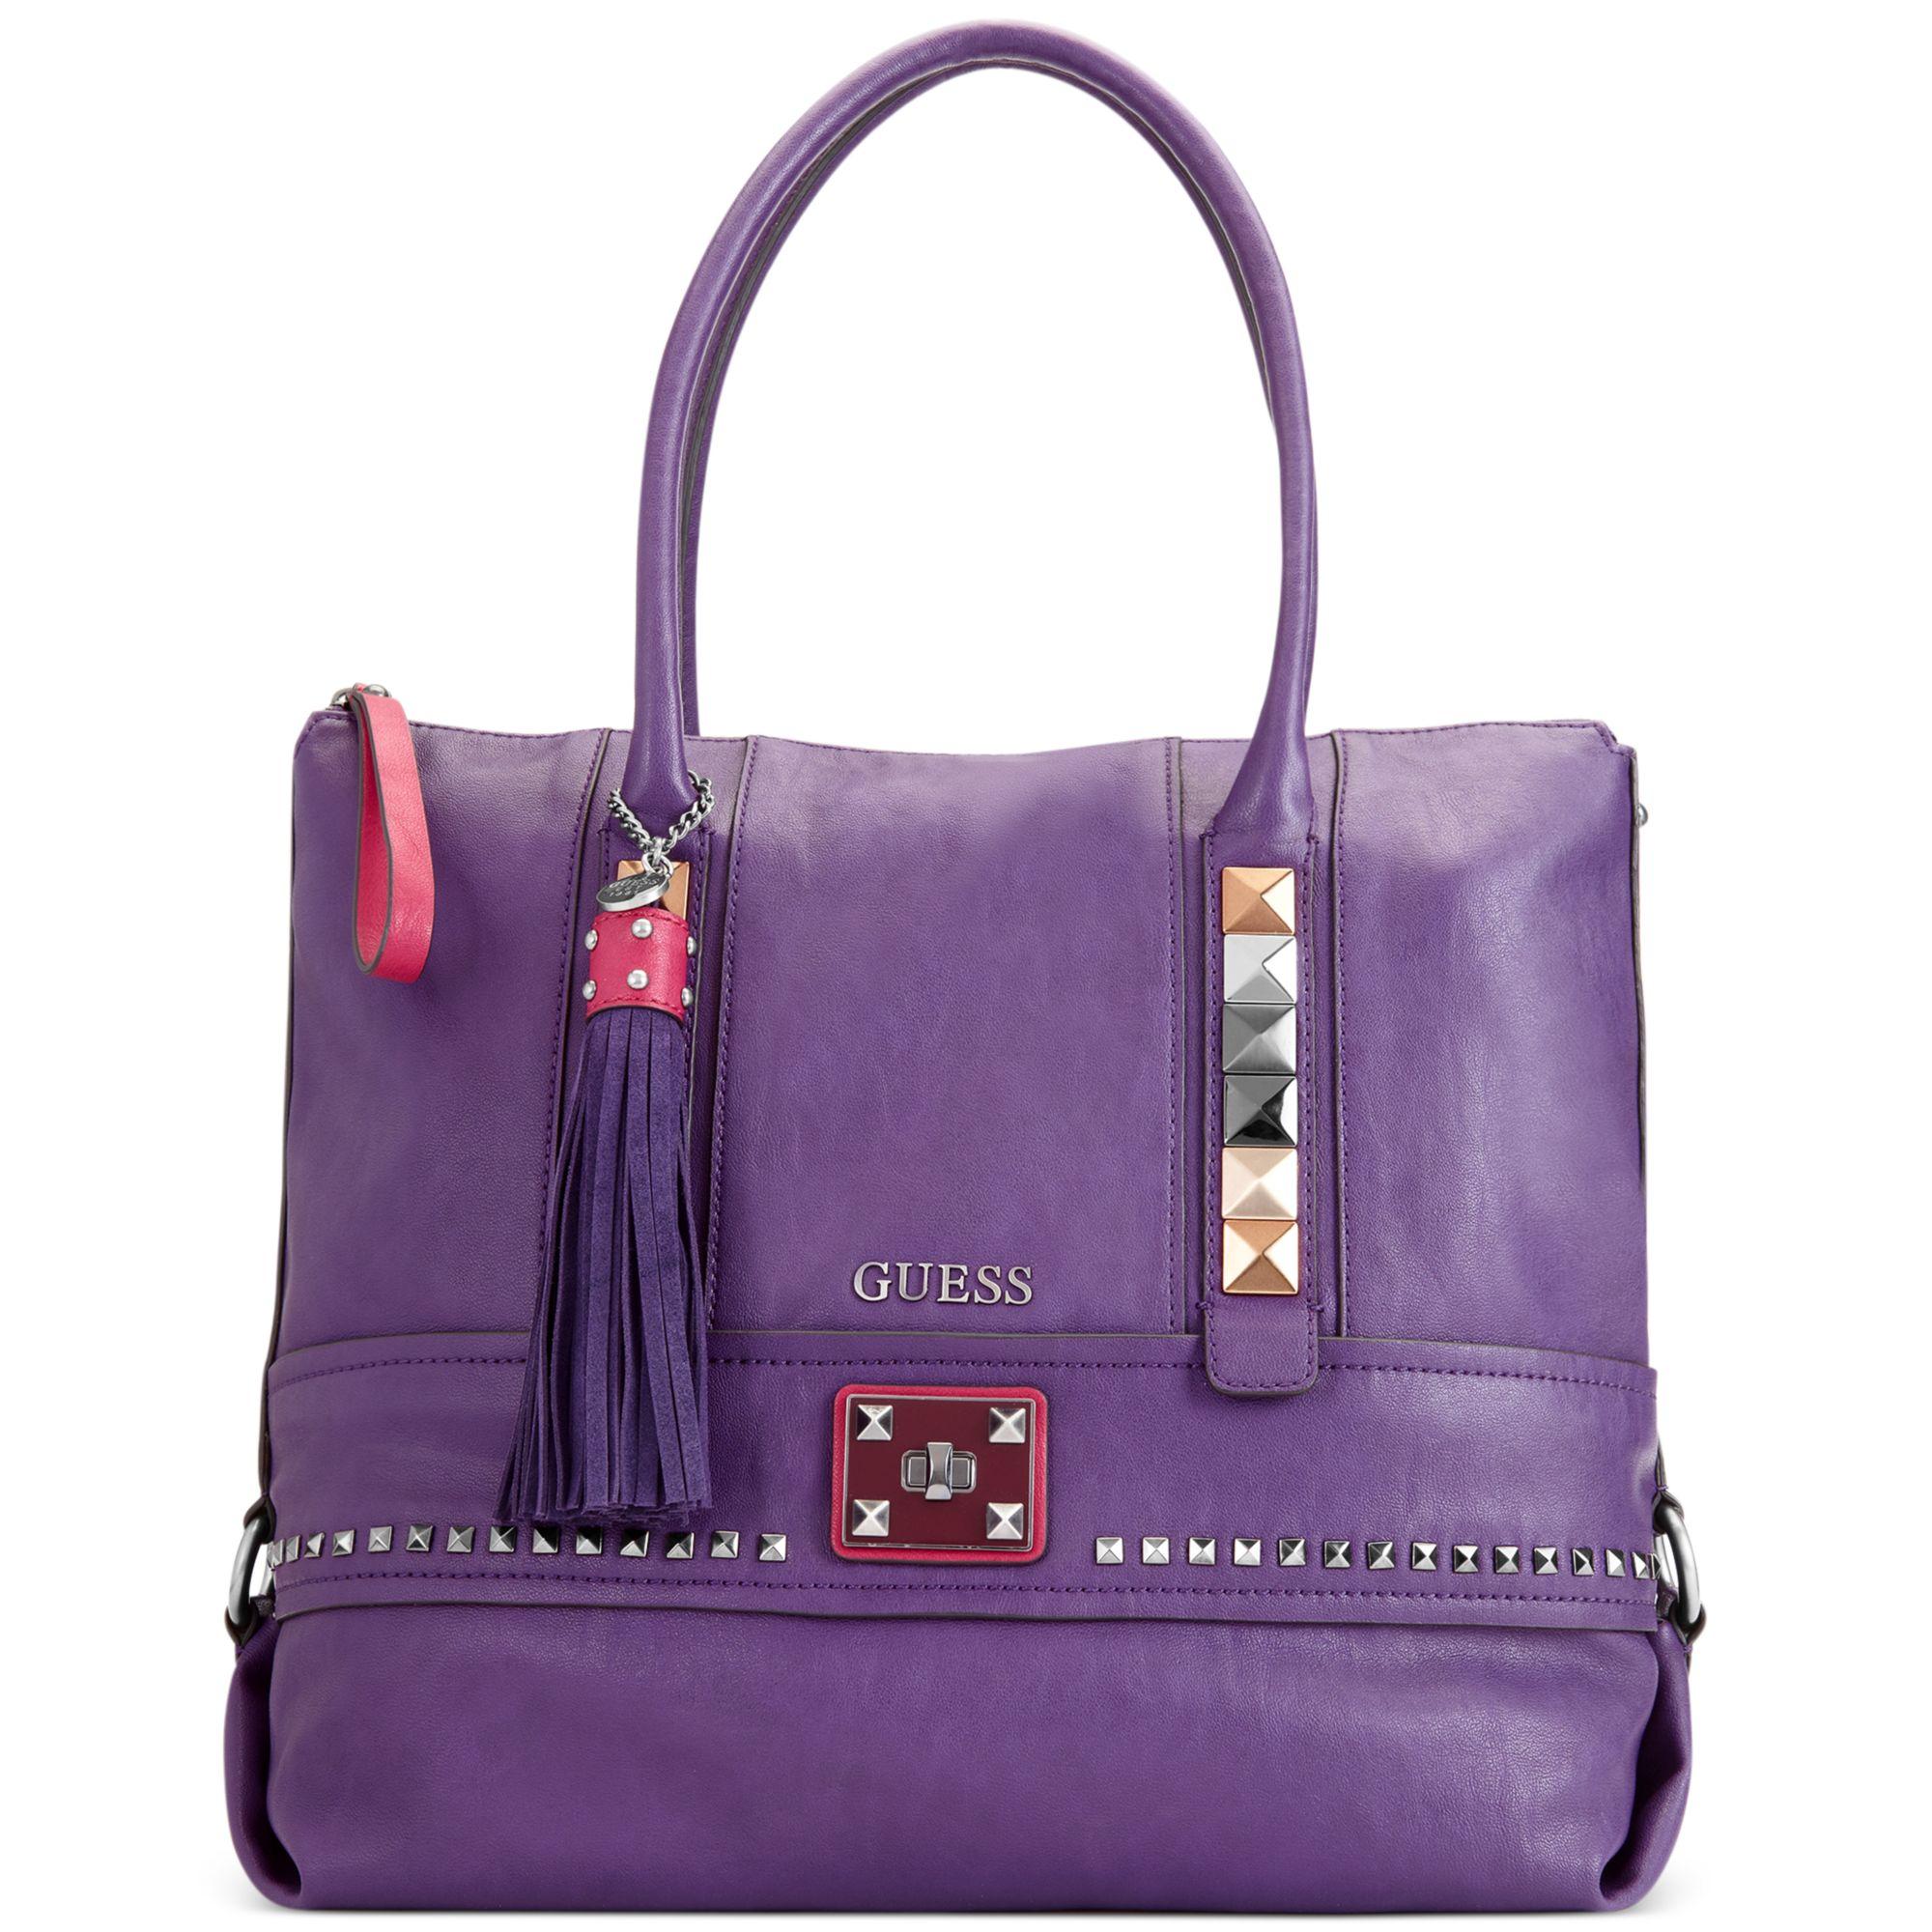 Handbag In Purple Lyst Large Guess Tote Camryn 0n4Znwq5XW